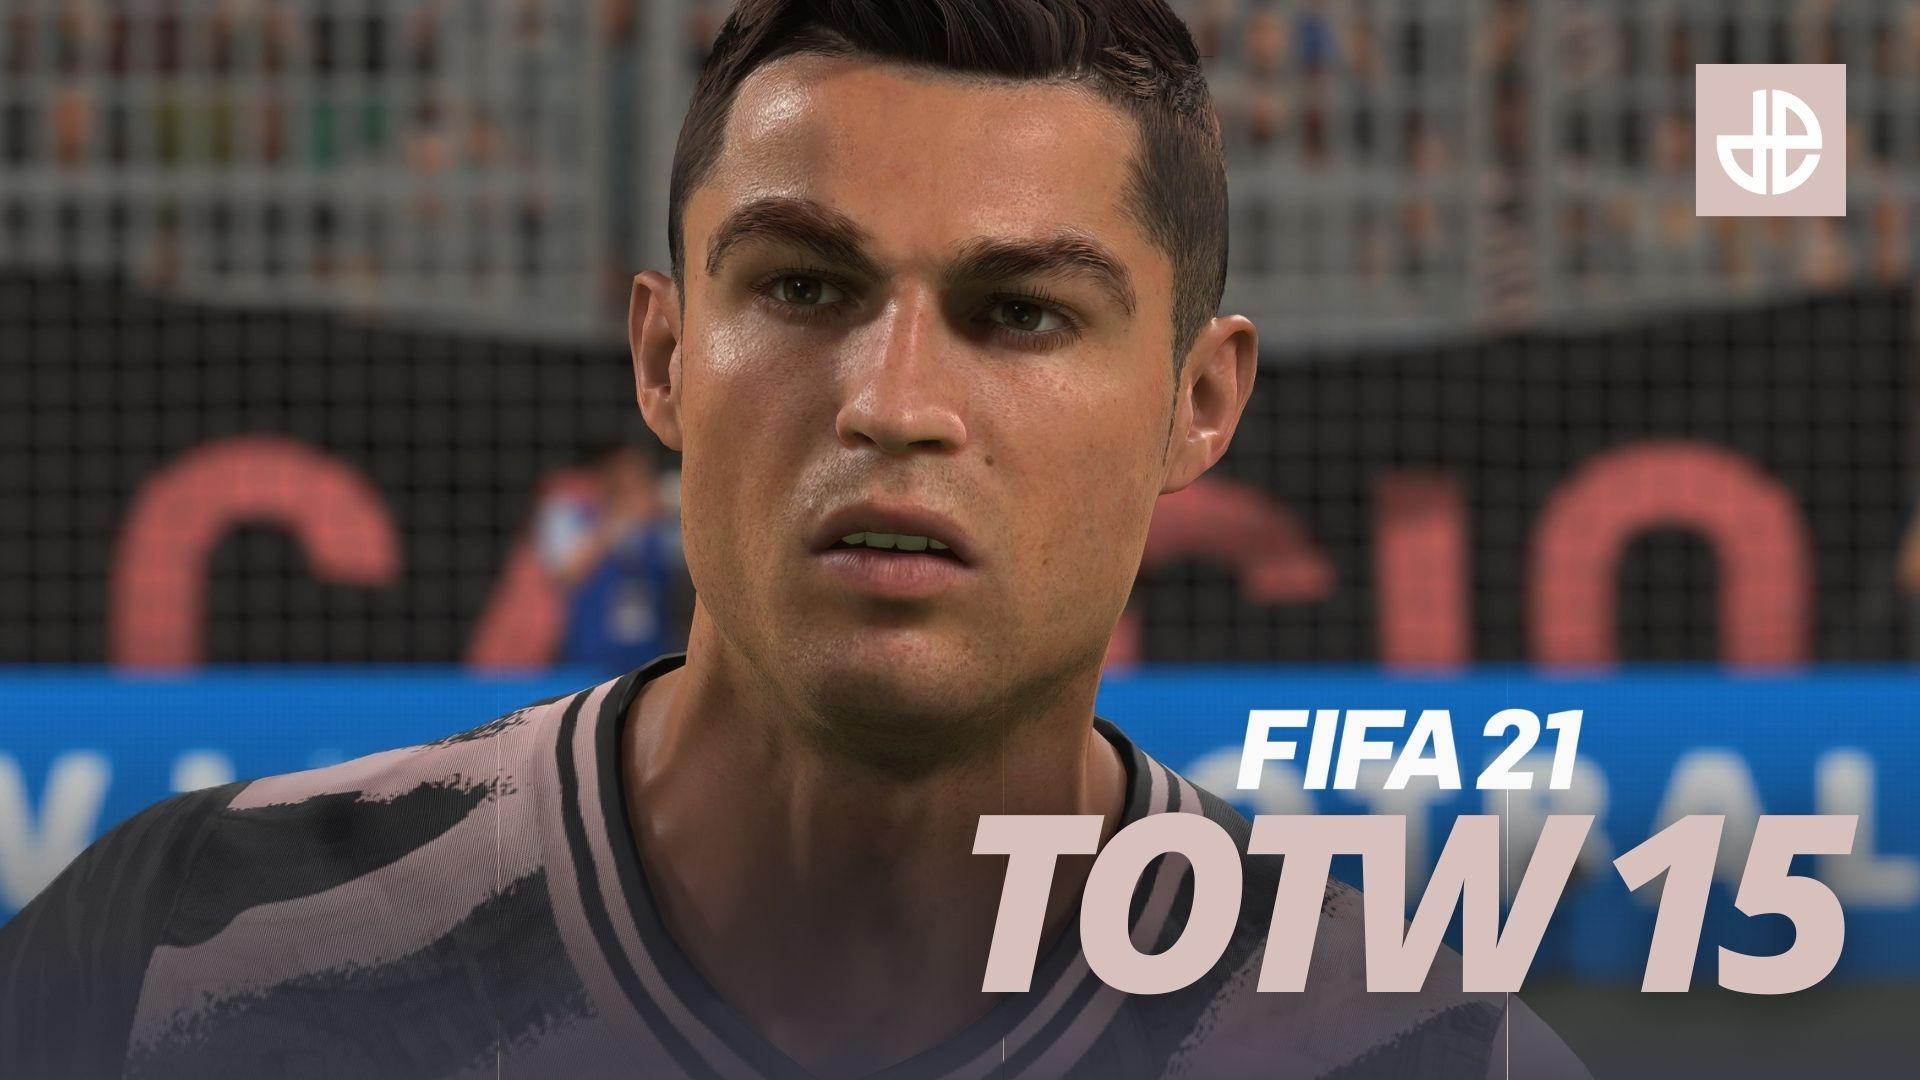 fifa 21 team of the week totw 15 ronaldo full team announced predictions leaks